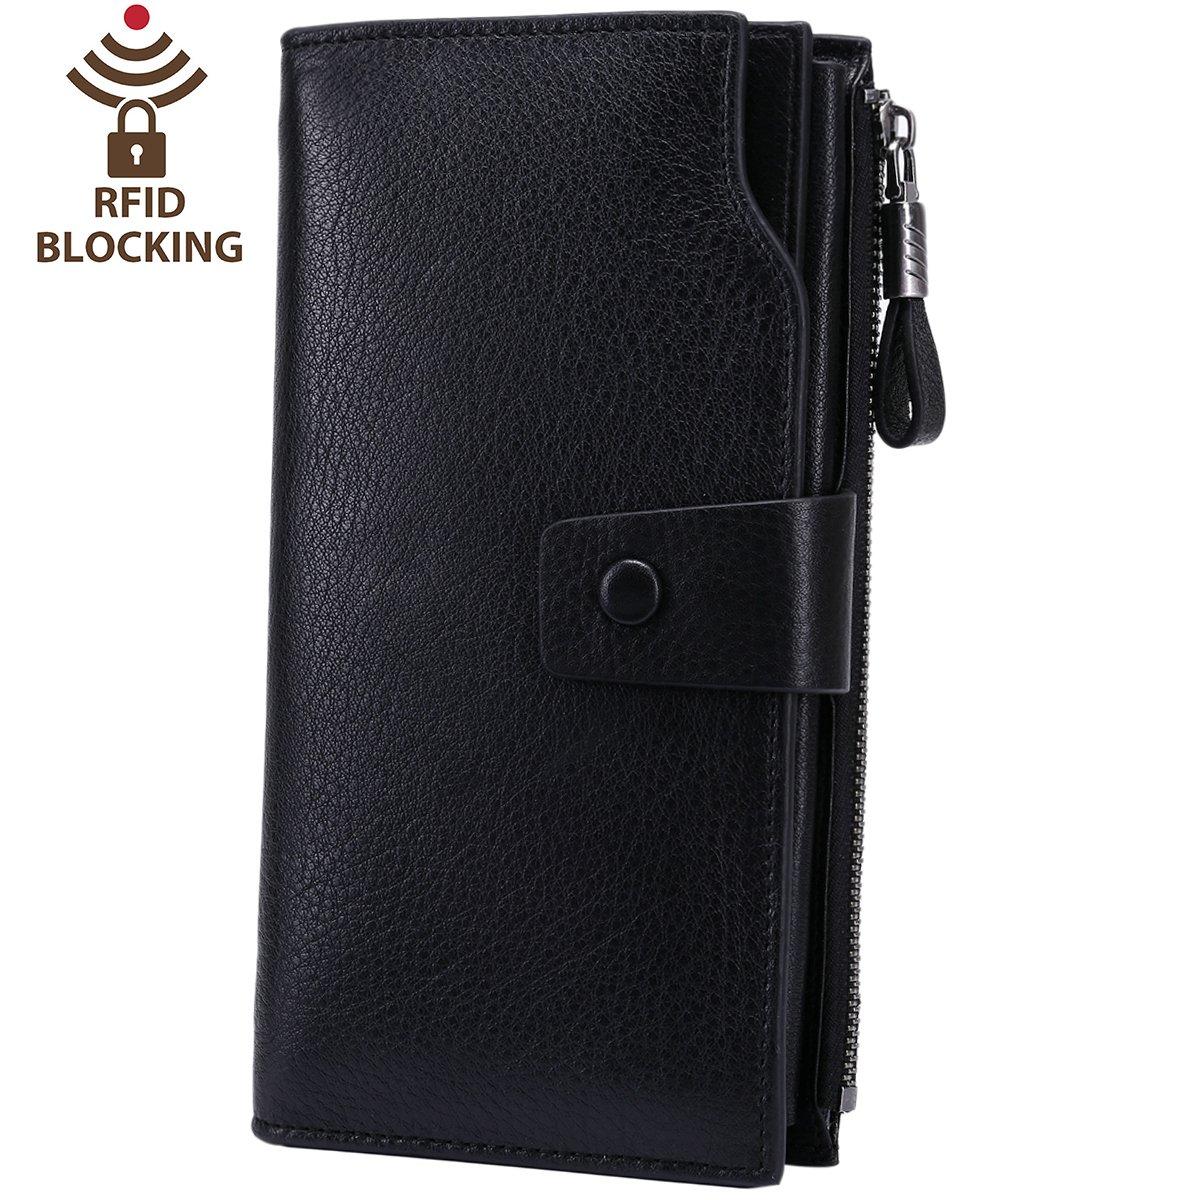 Itslife Women's RFID Blocking Large Capacity Luxury Wax Genuine Leather Cluth Wallet Card Holder Ladies Purse (Natural Black RFID BLOCKING)